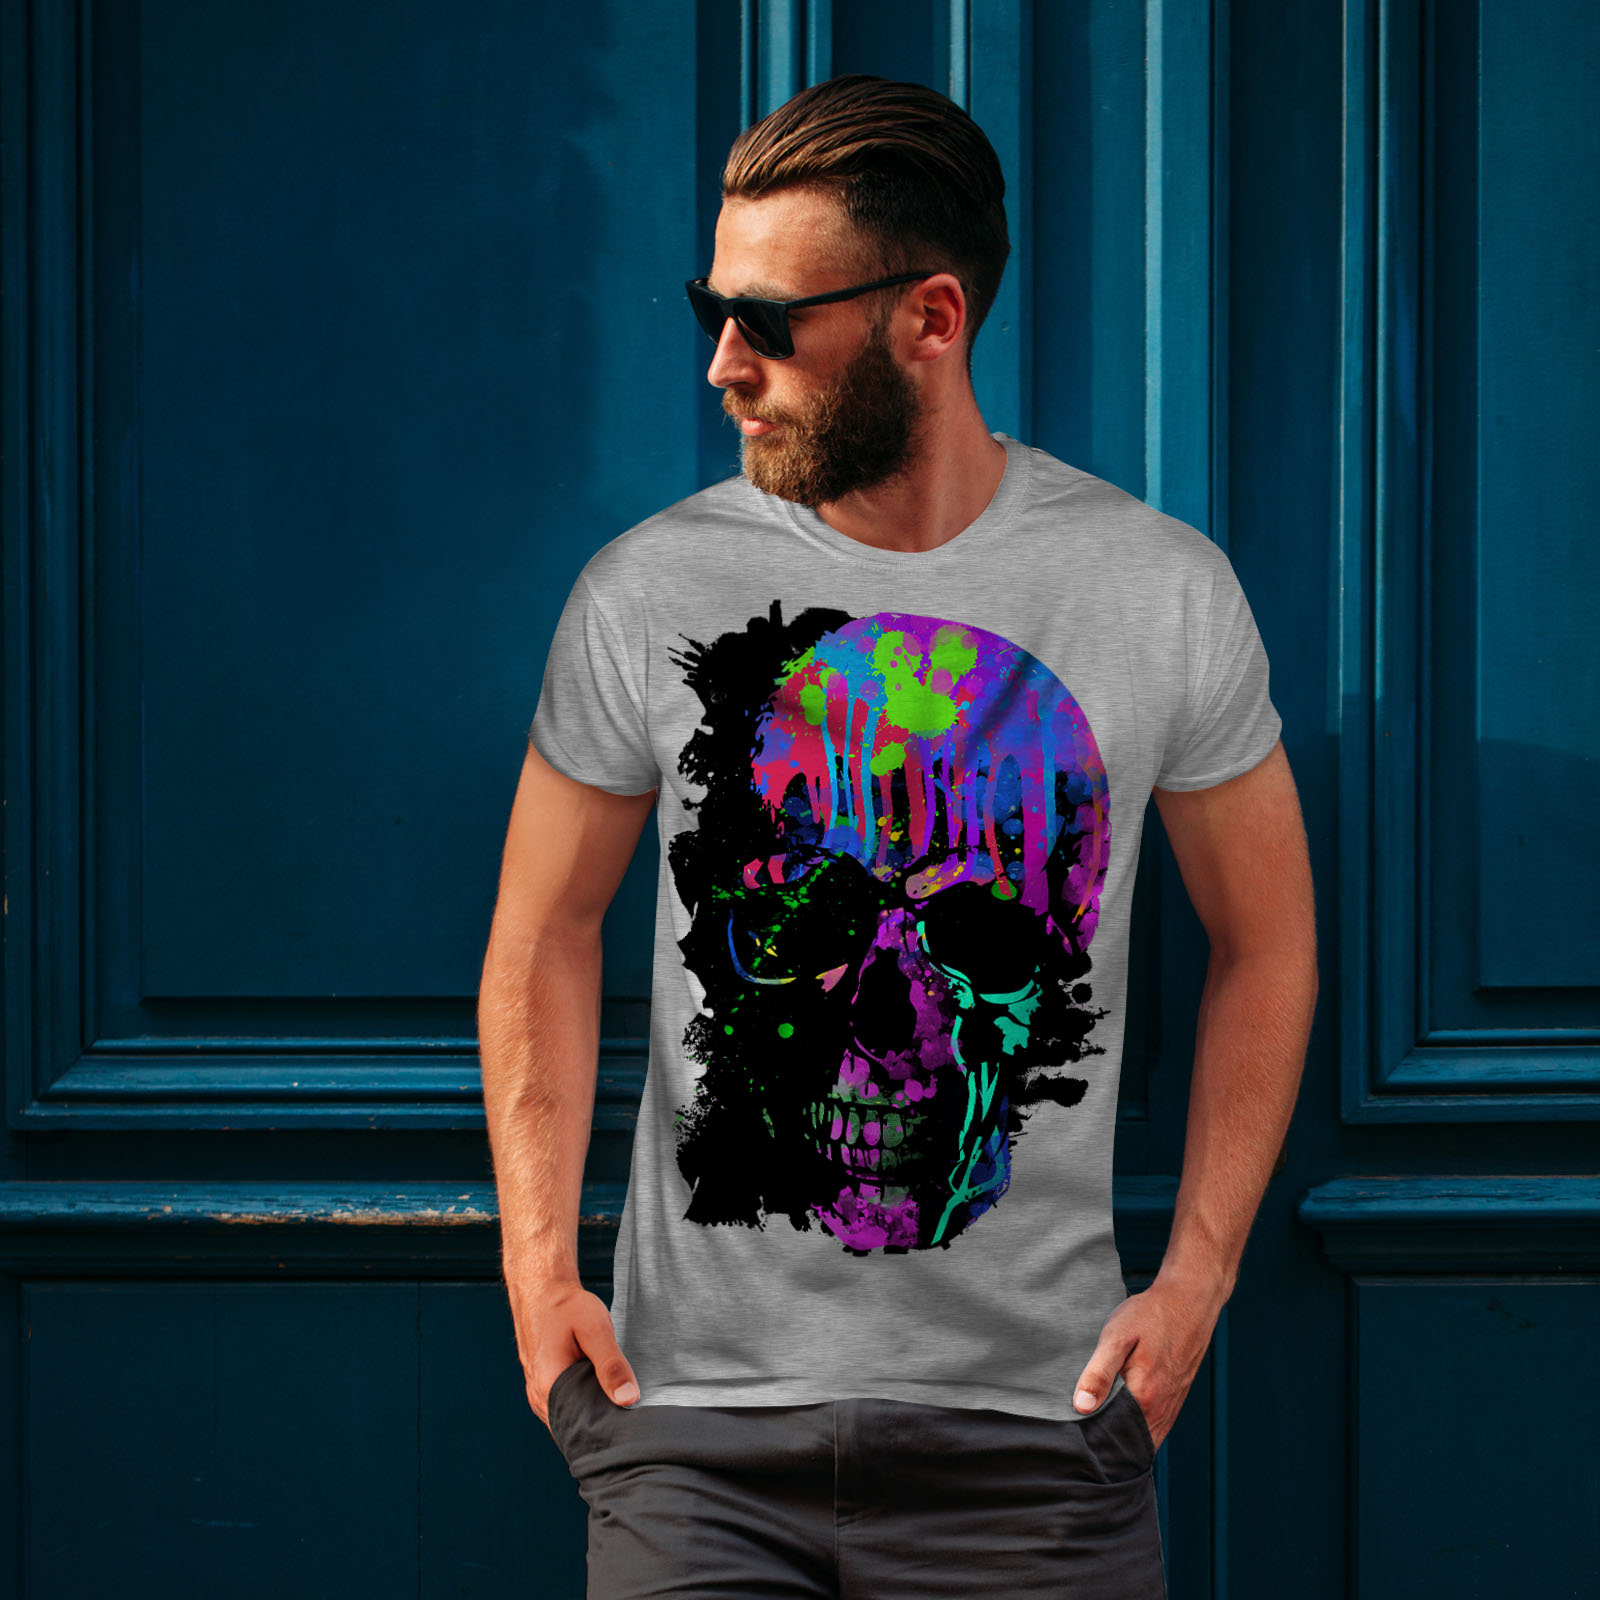 Wellcoda-Skull-Artsy-Mens-T-shirt-Neon-Night-Graphic-Design-Printed-Tee thumbnail 16